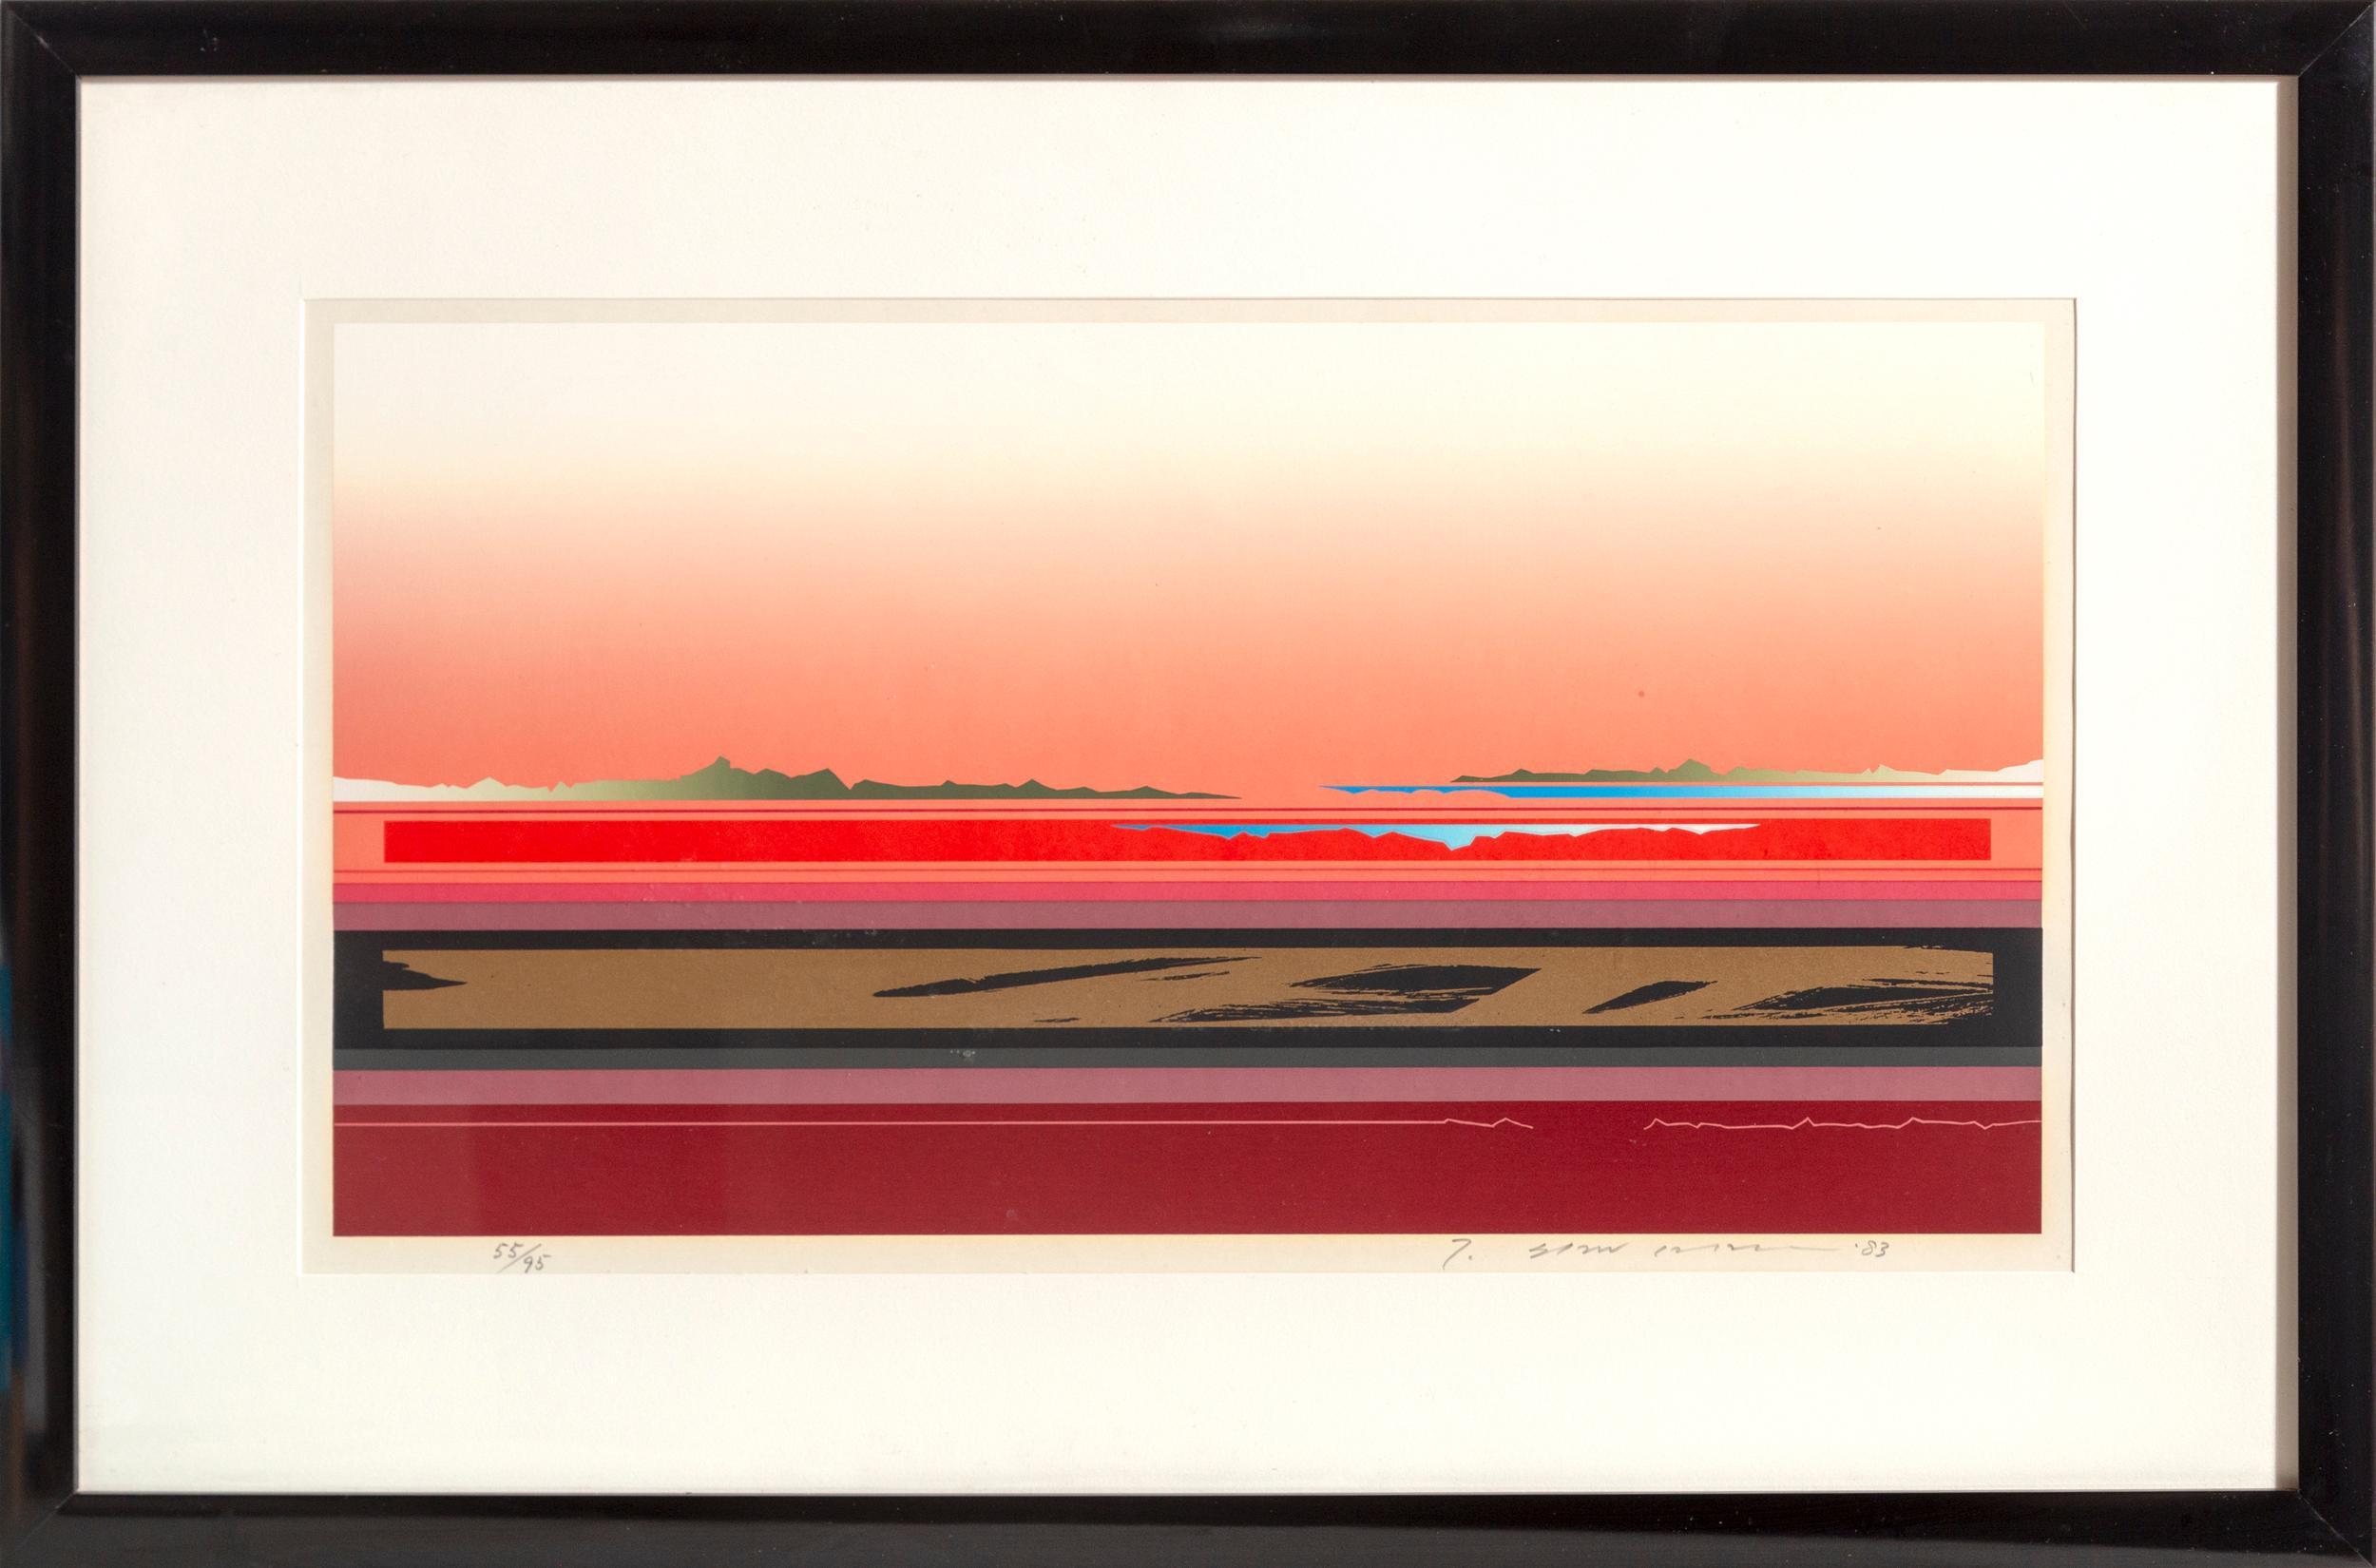 Tetsuro Sawada, Red Horizon, Screenprint